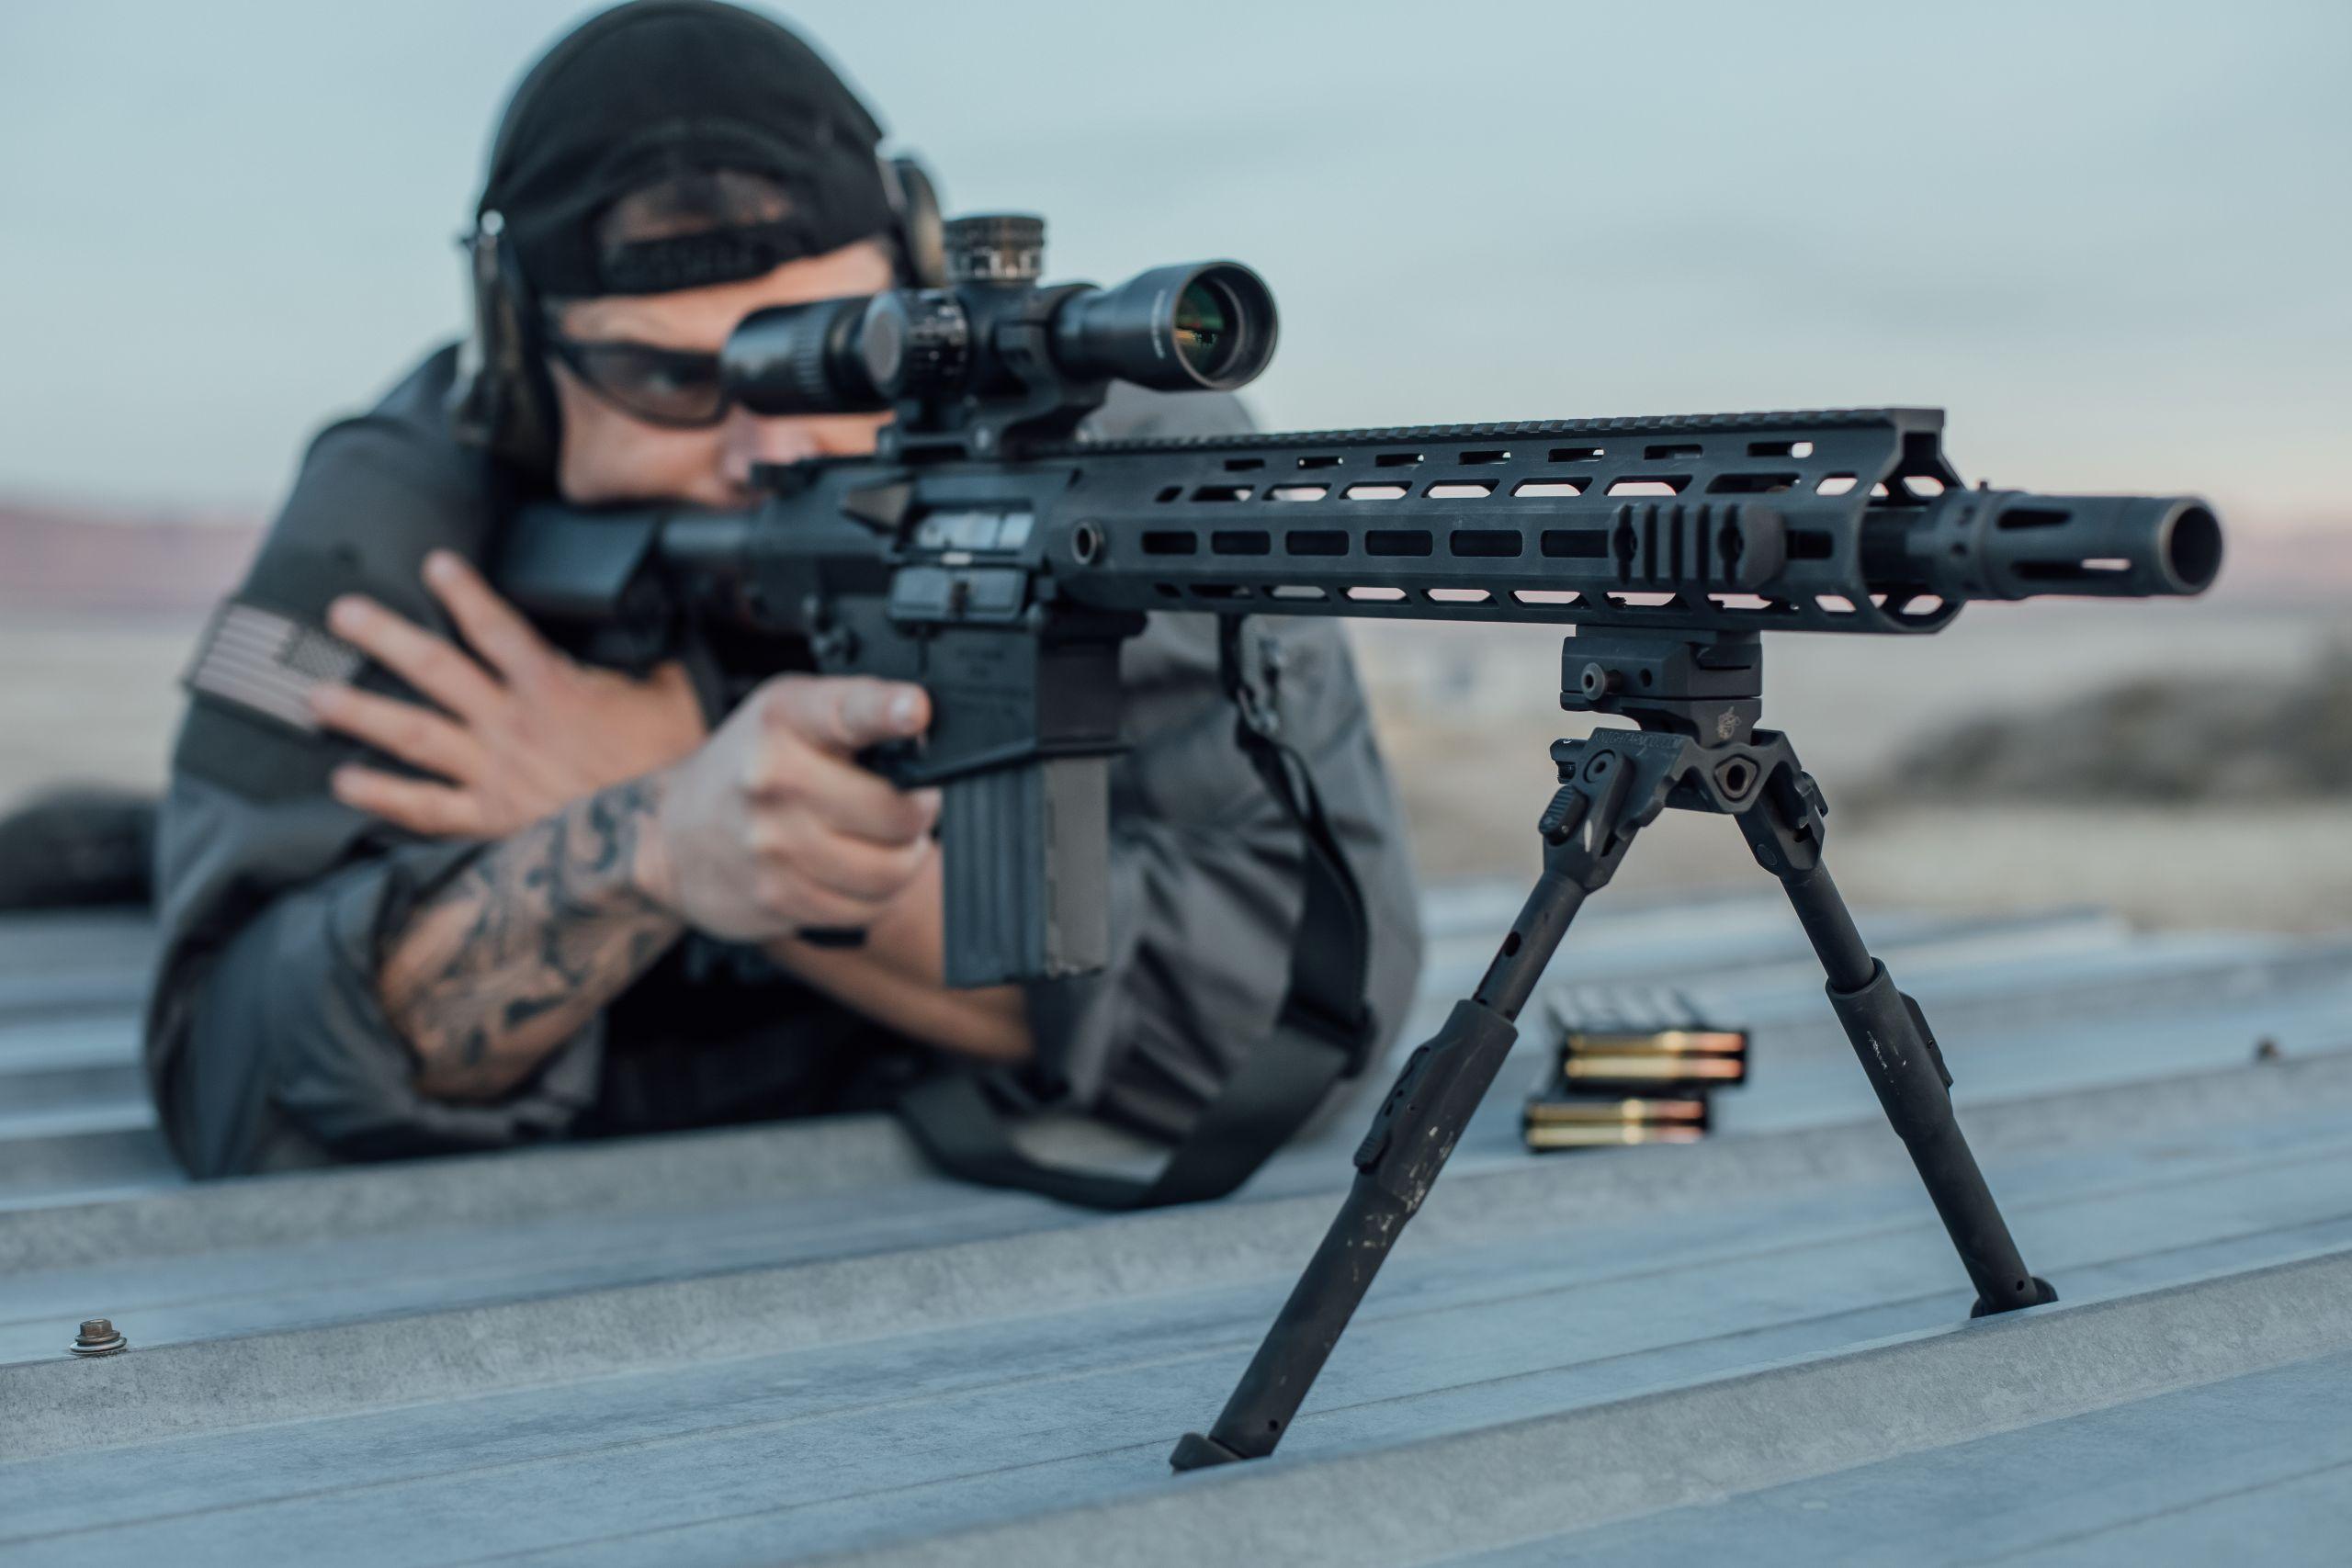 Knight's Armament Promo Image - Man Behind KAC Rifle